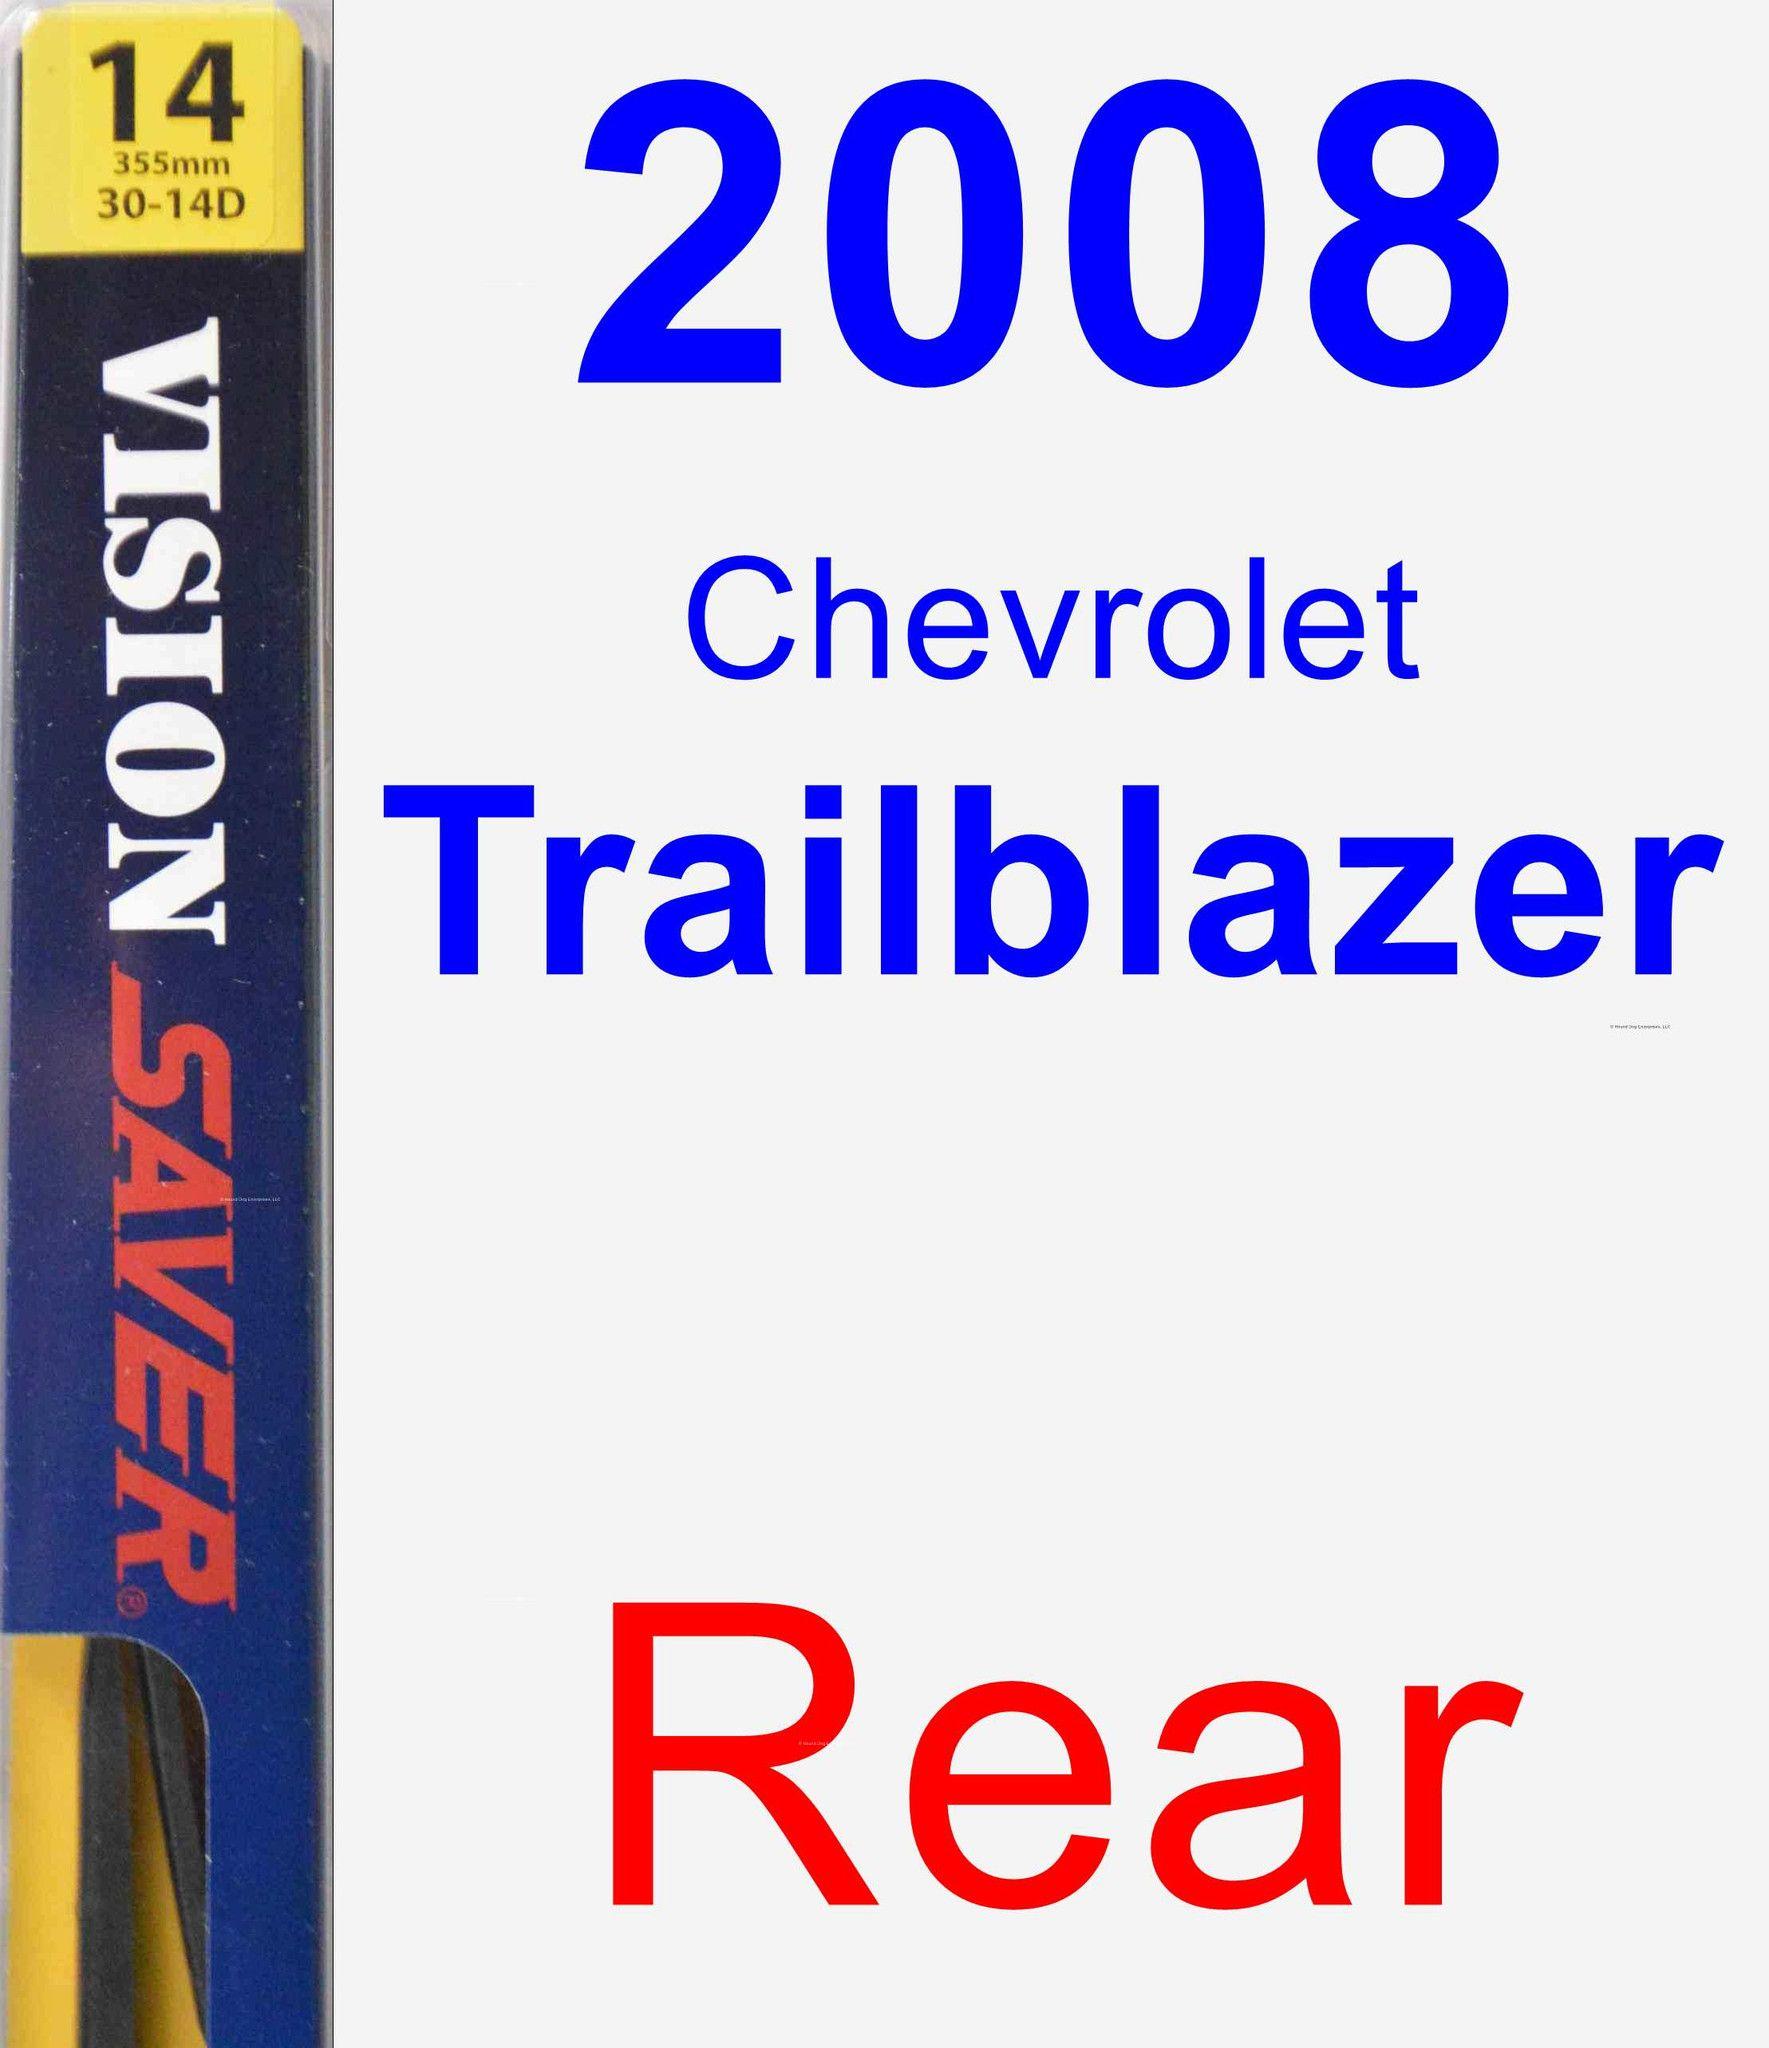 Rear Wiper Blade For 2008 Chevrolet Trailblazer